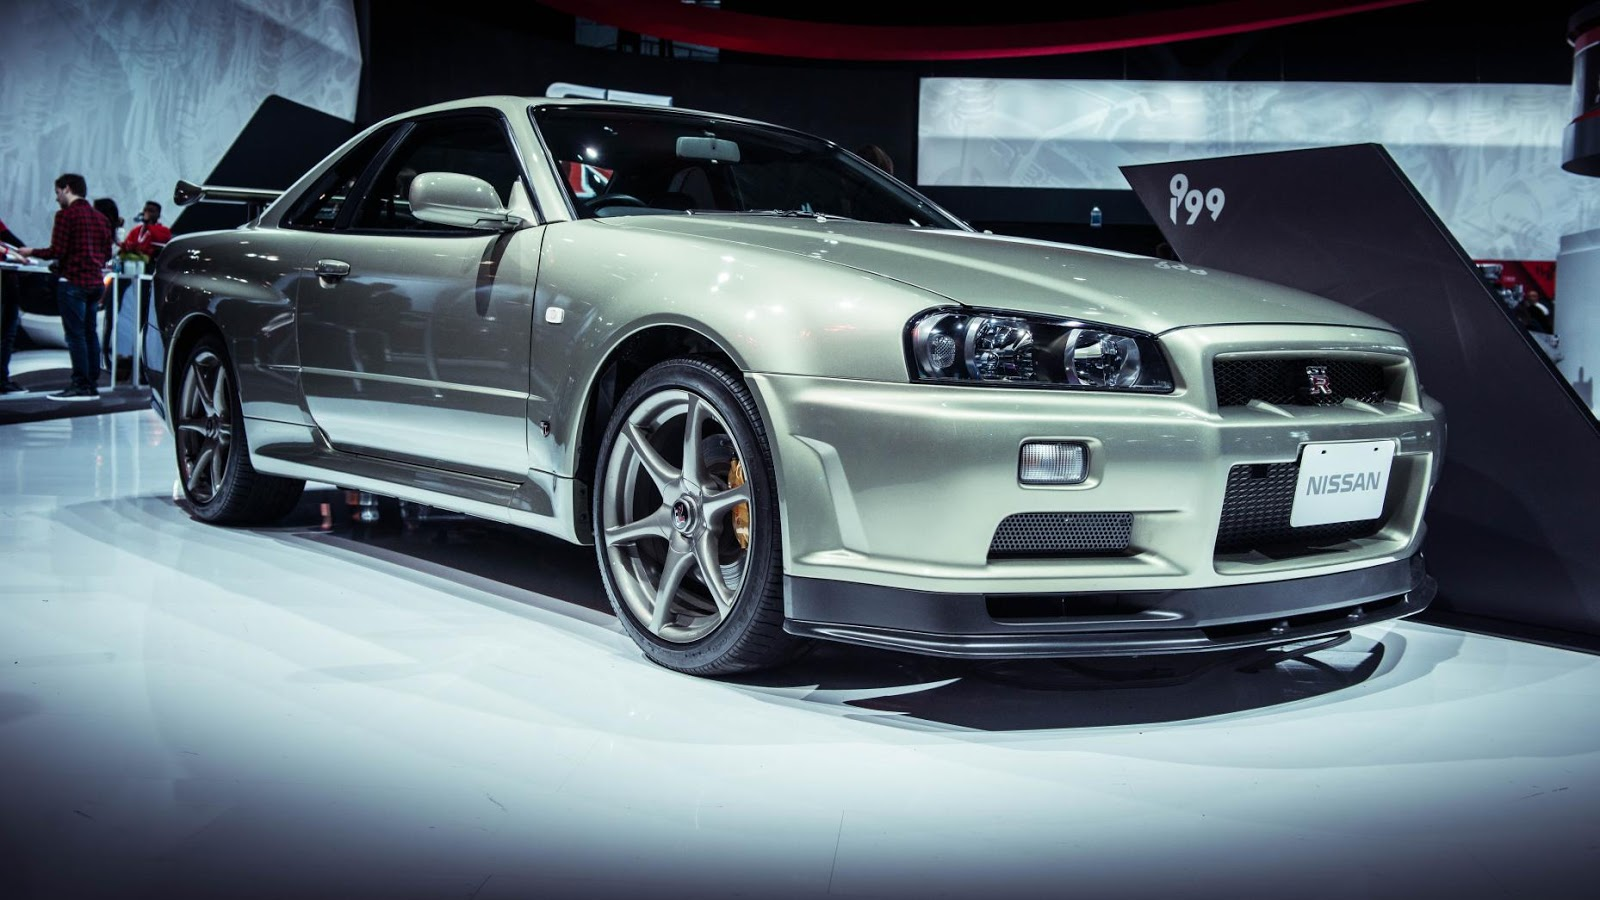 R34 Nissan Skyline GT-R M-Spec